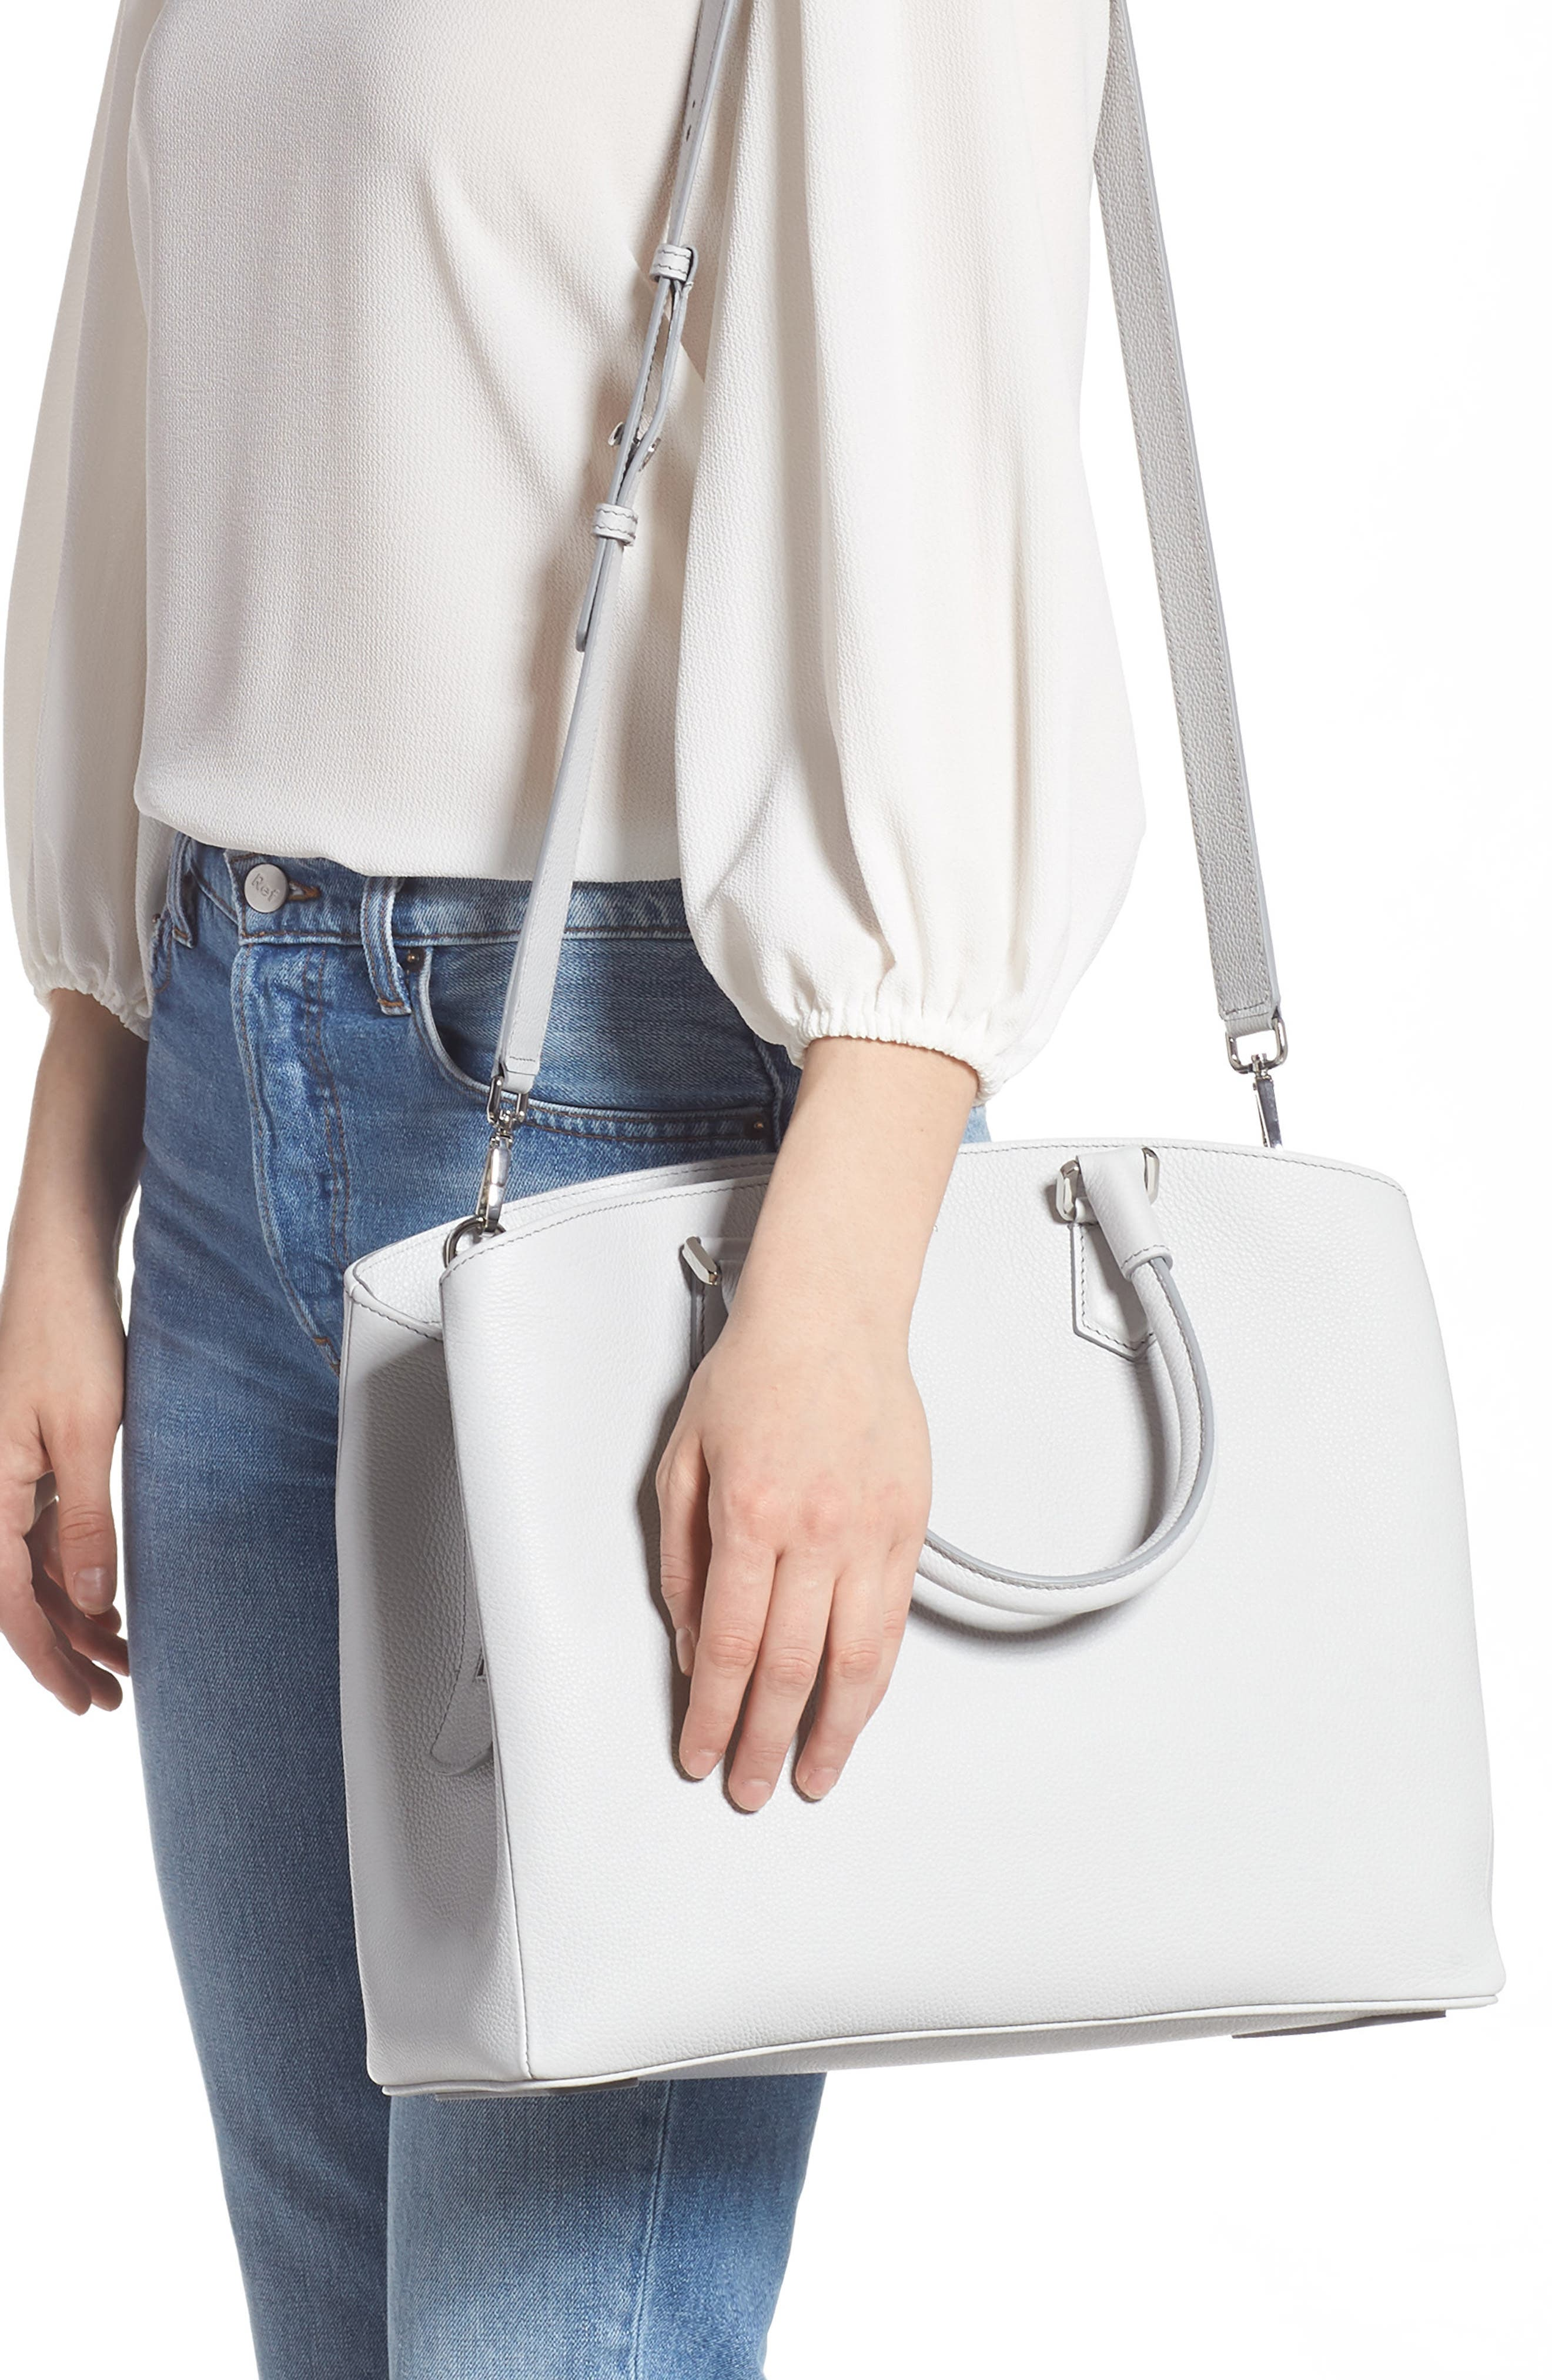 016d62ec1015 Women s Designer Handbags   Wallets